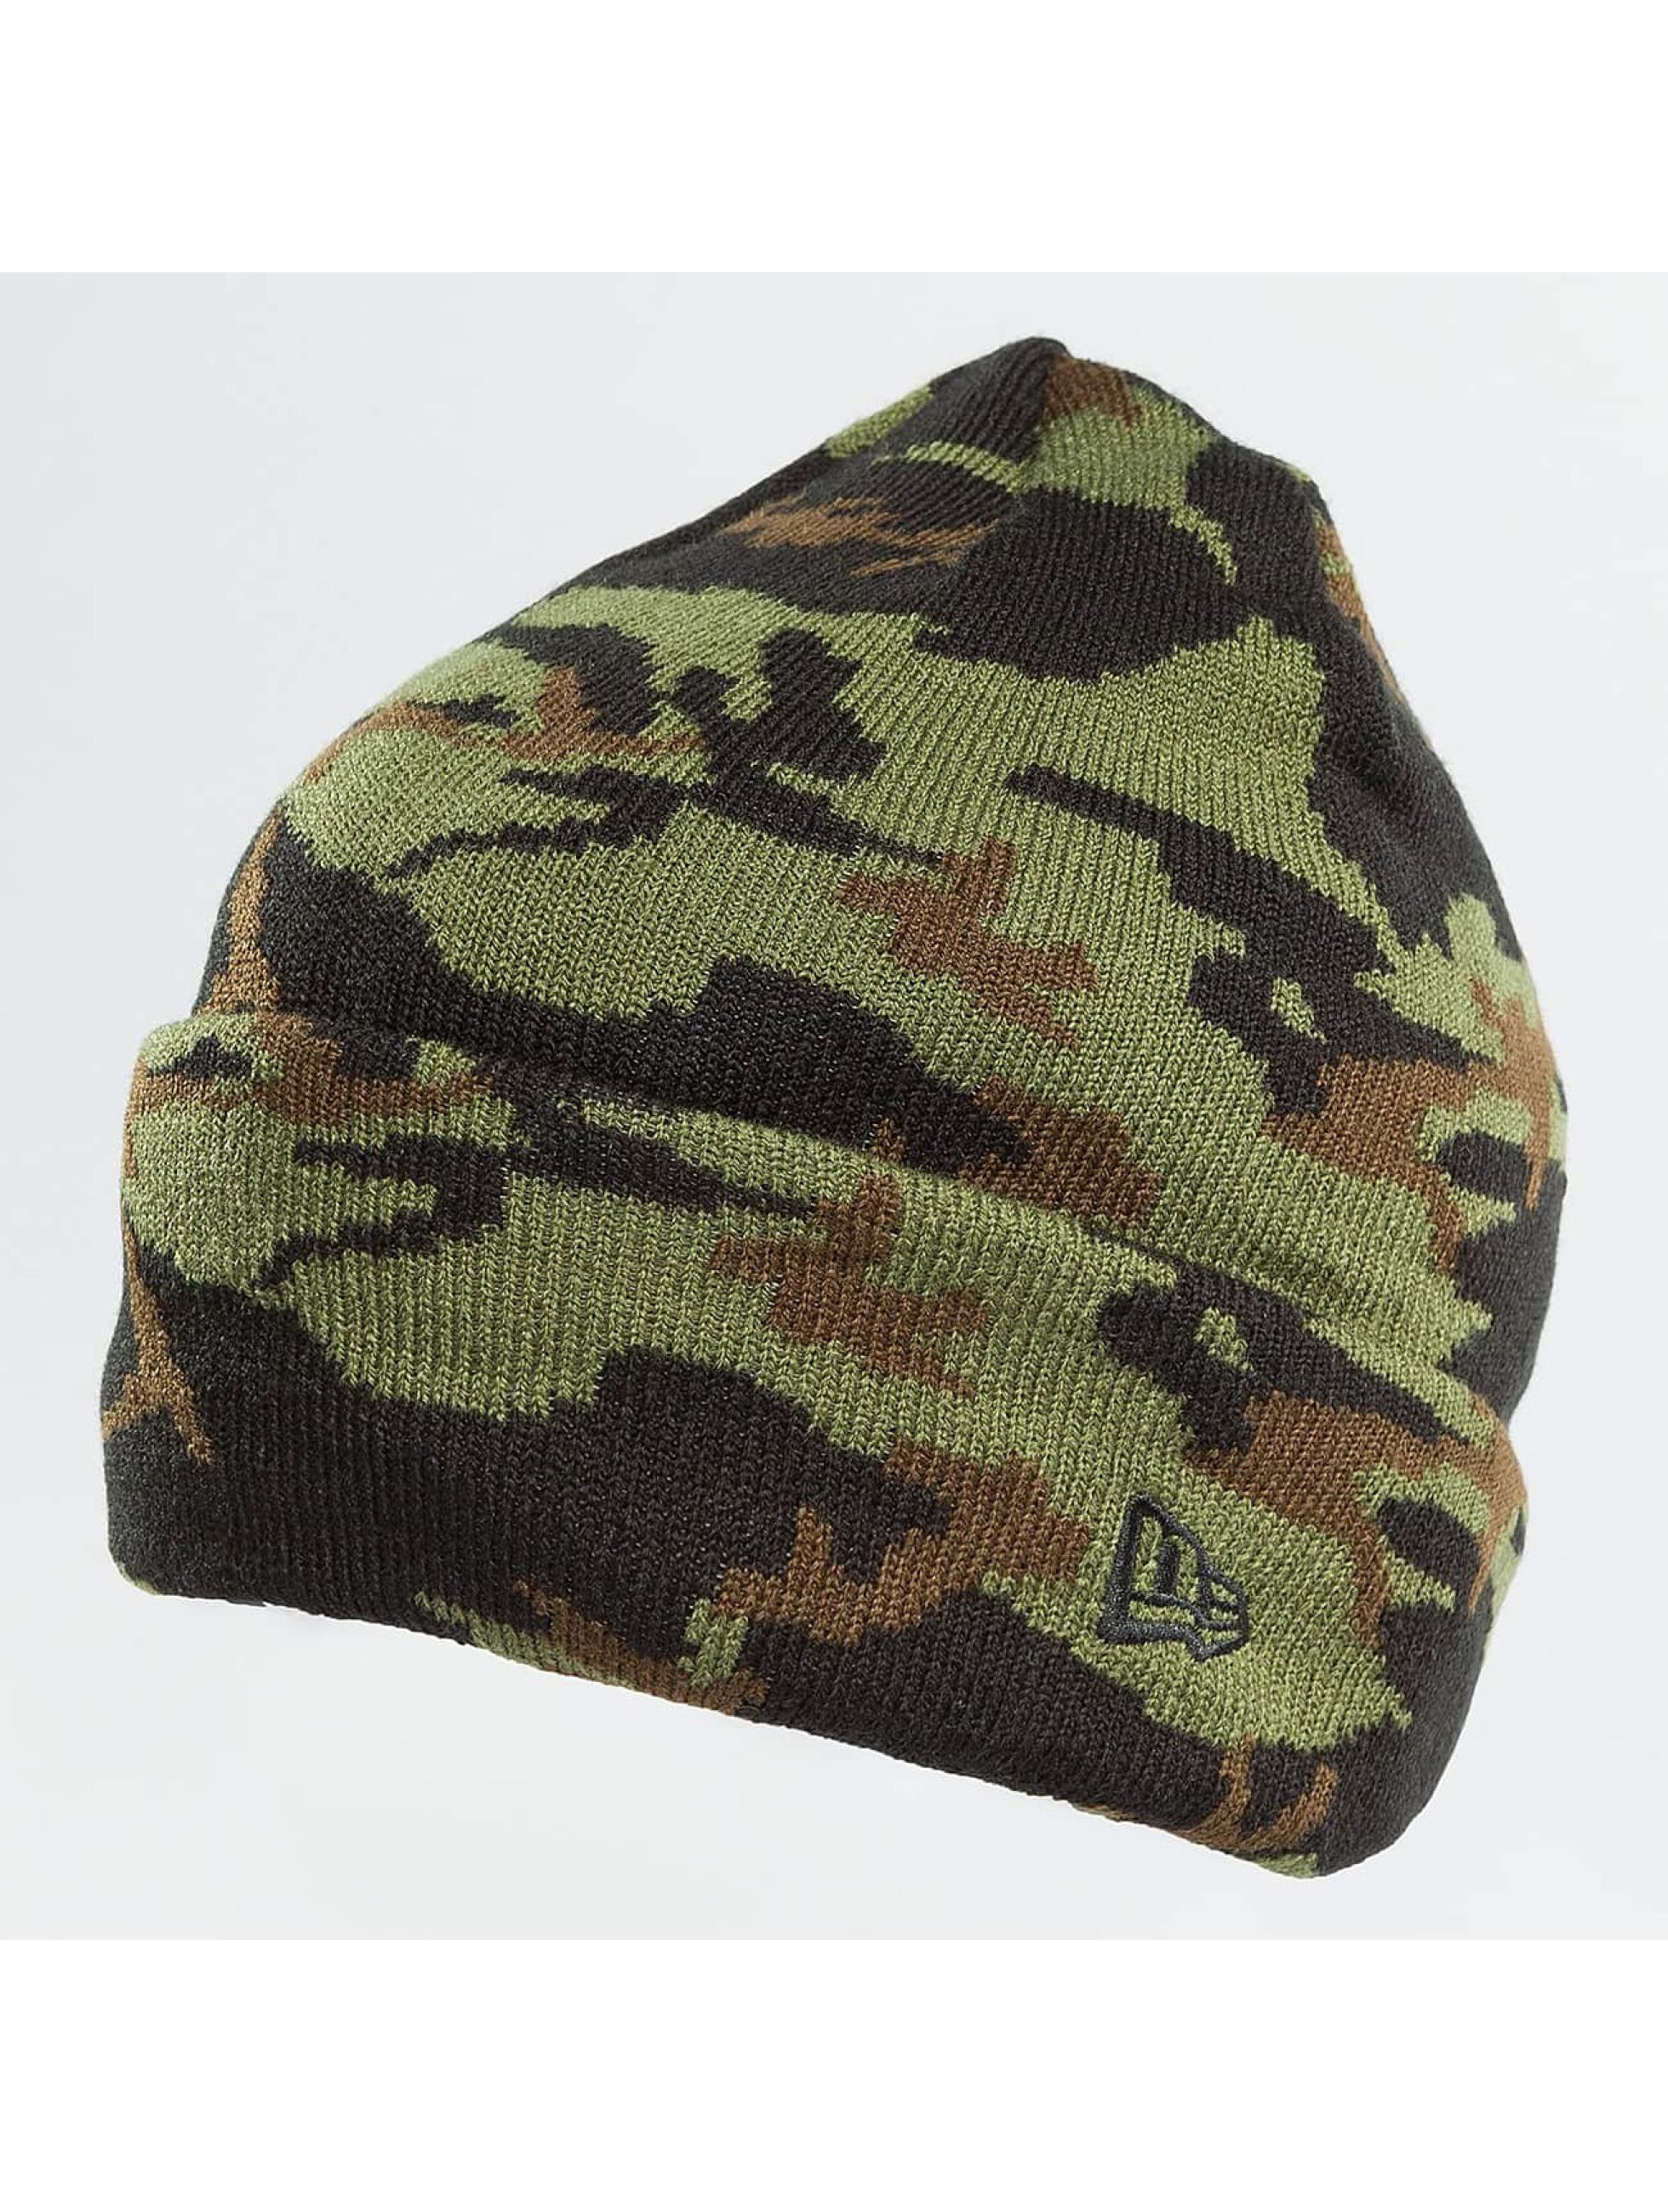 New Era Pipot New Era Camo Cuff Beanie Woodland camouflage